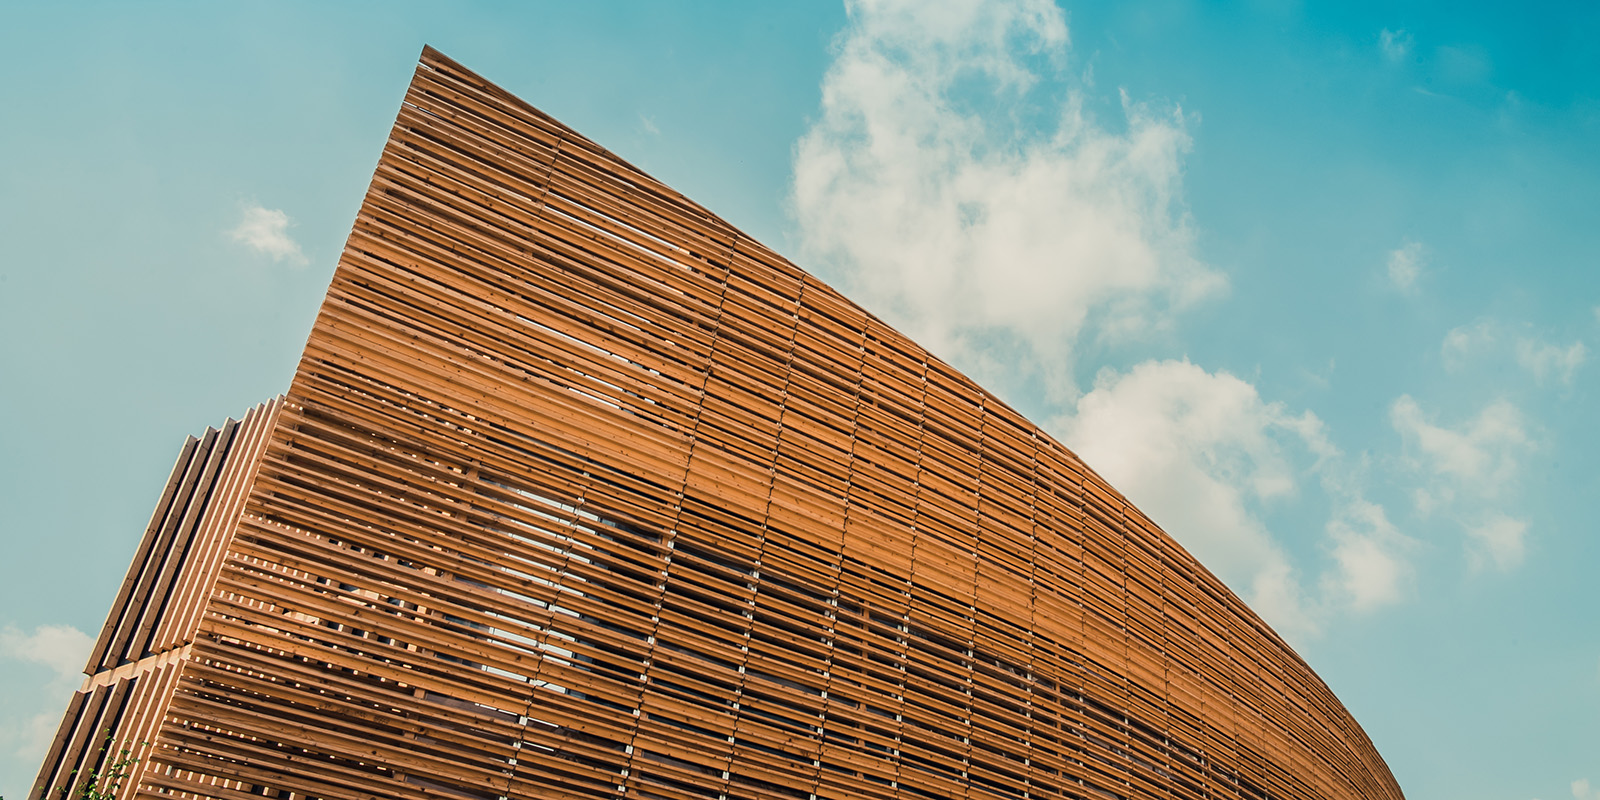 wood-building-detail